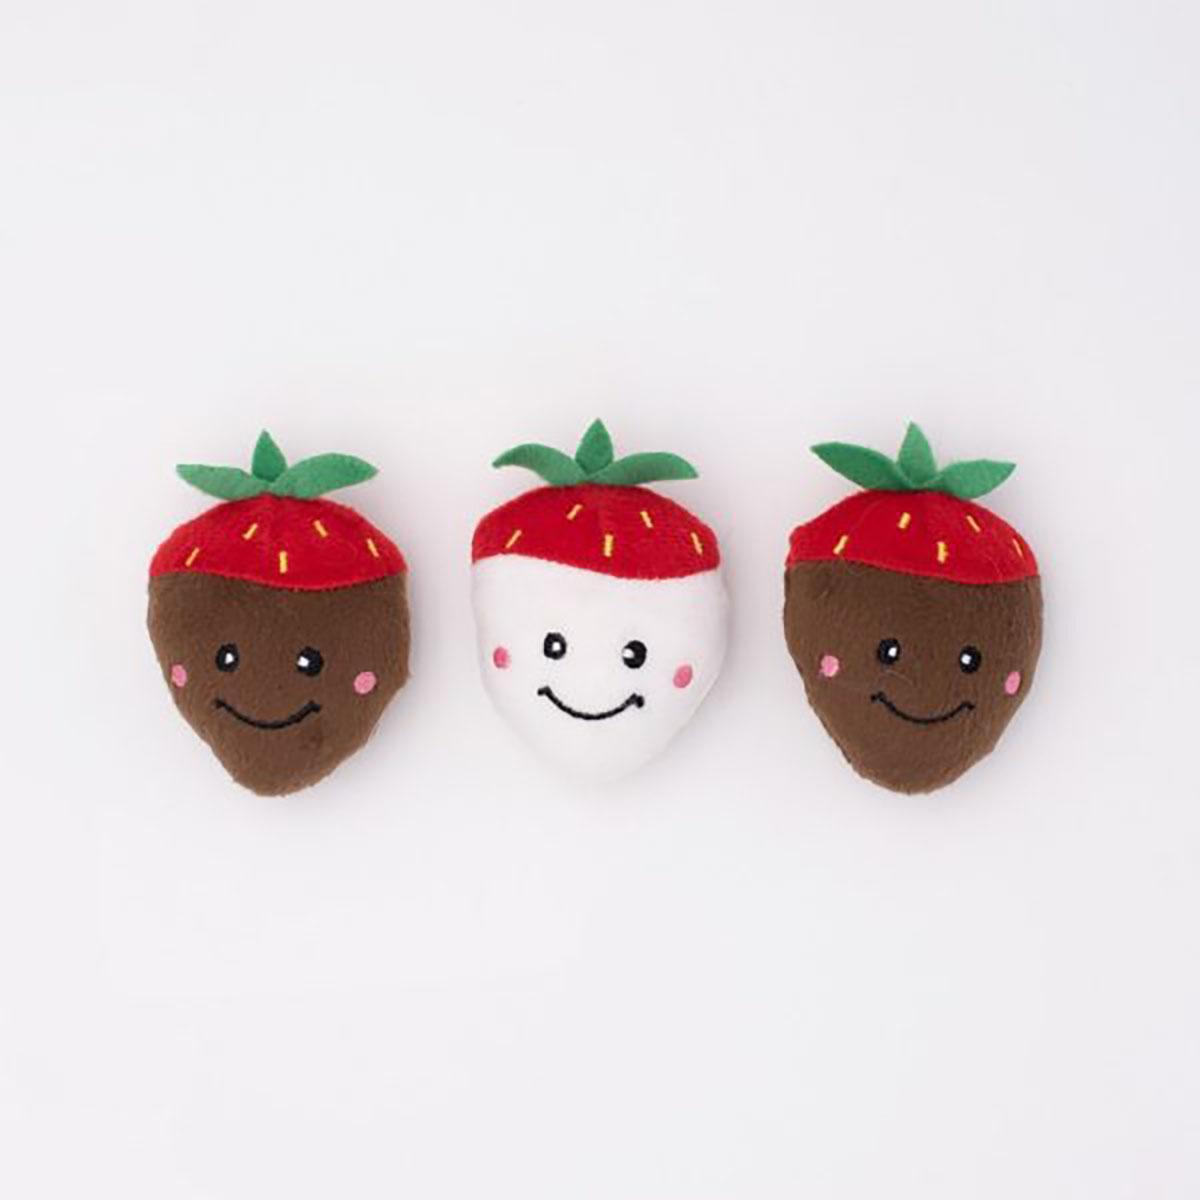 ZippyPaws Valentine's Miniz Dog Toys - Chocolate Covered Strawberries